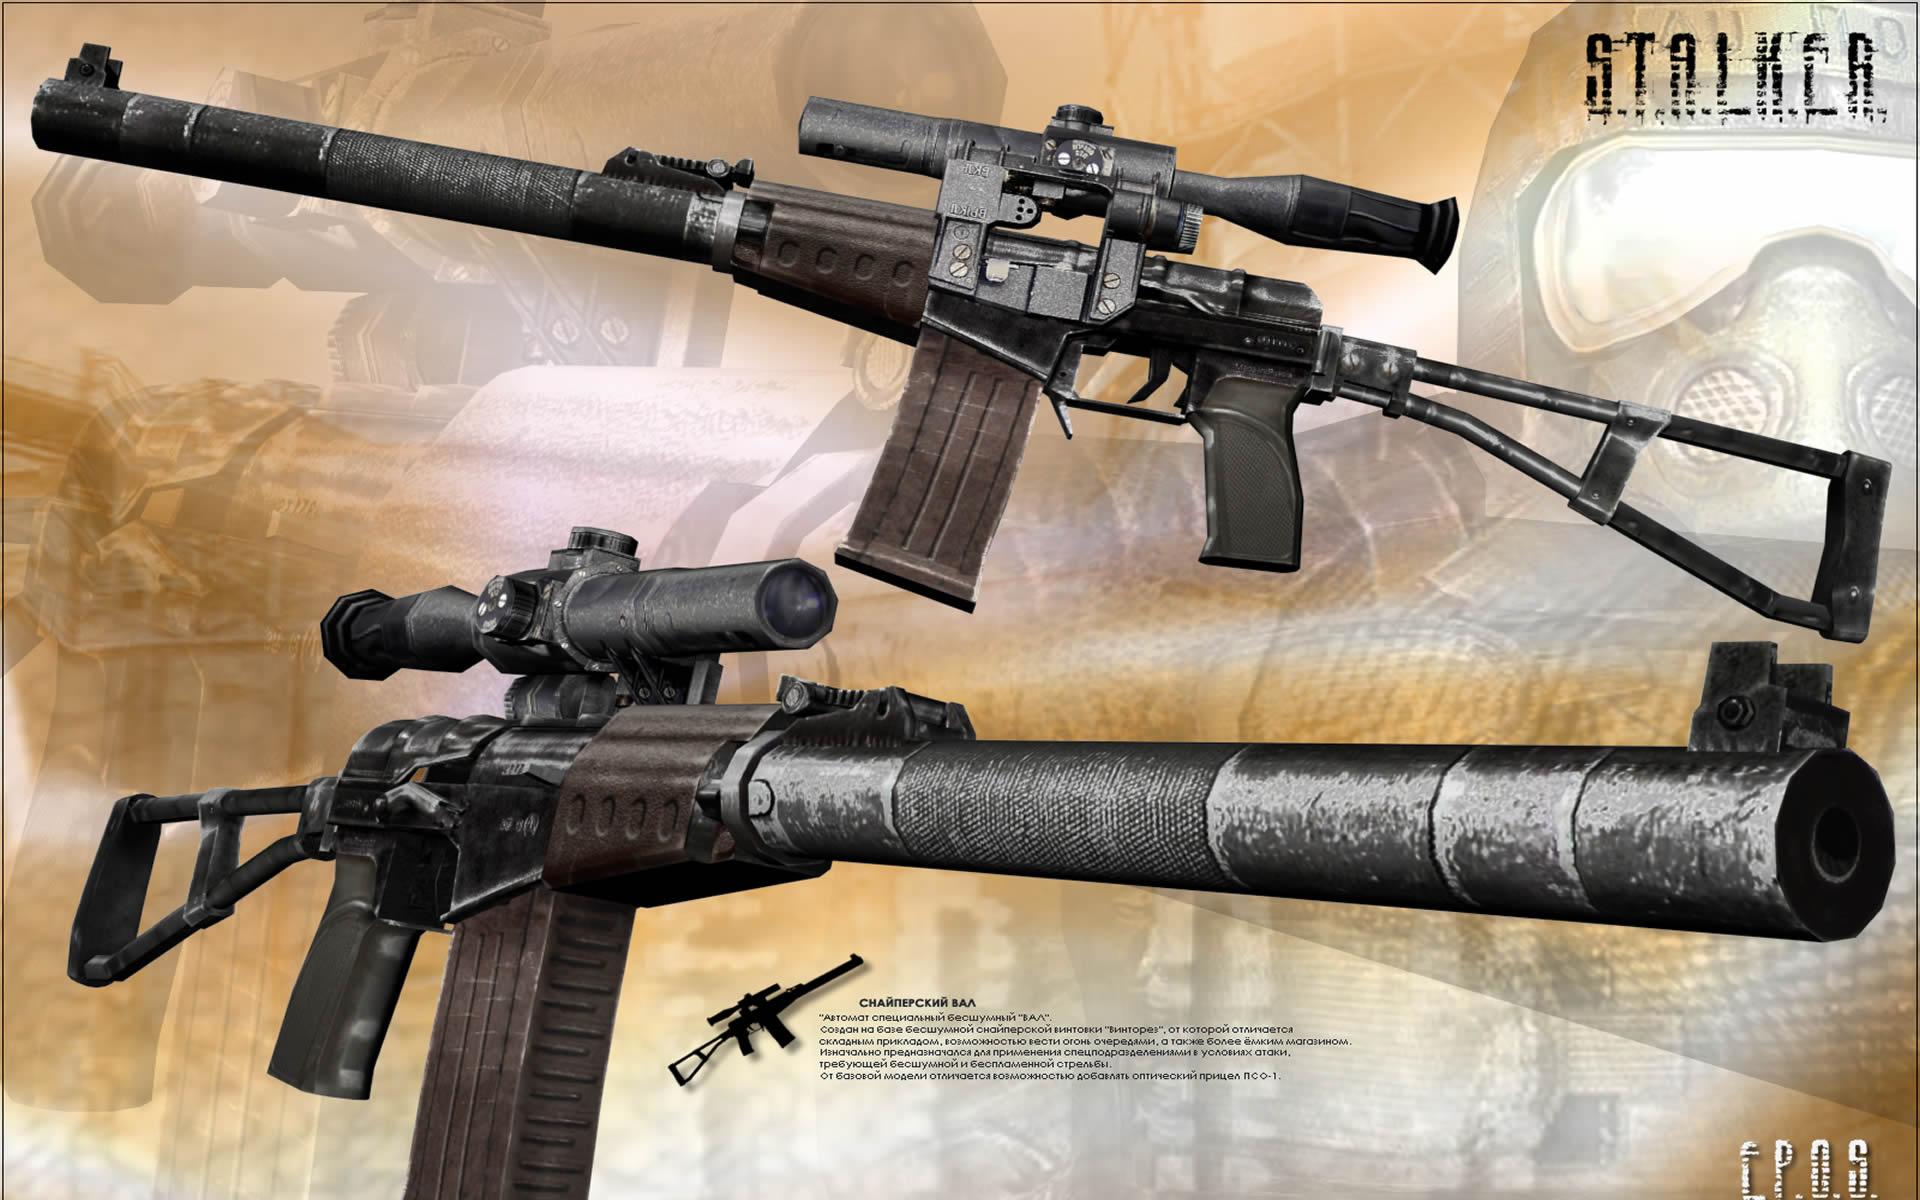 Silenced Scoped Sniper Rifle